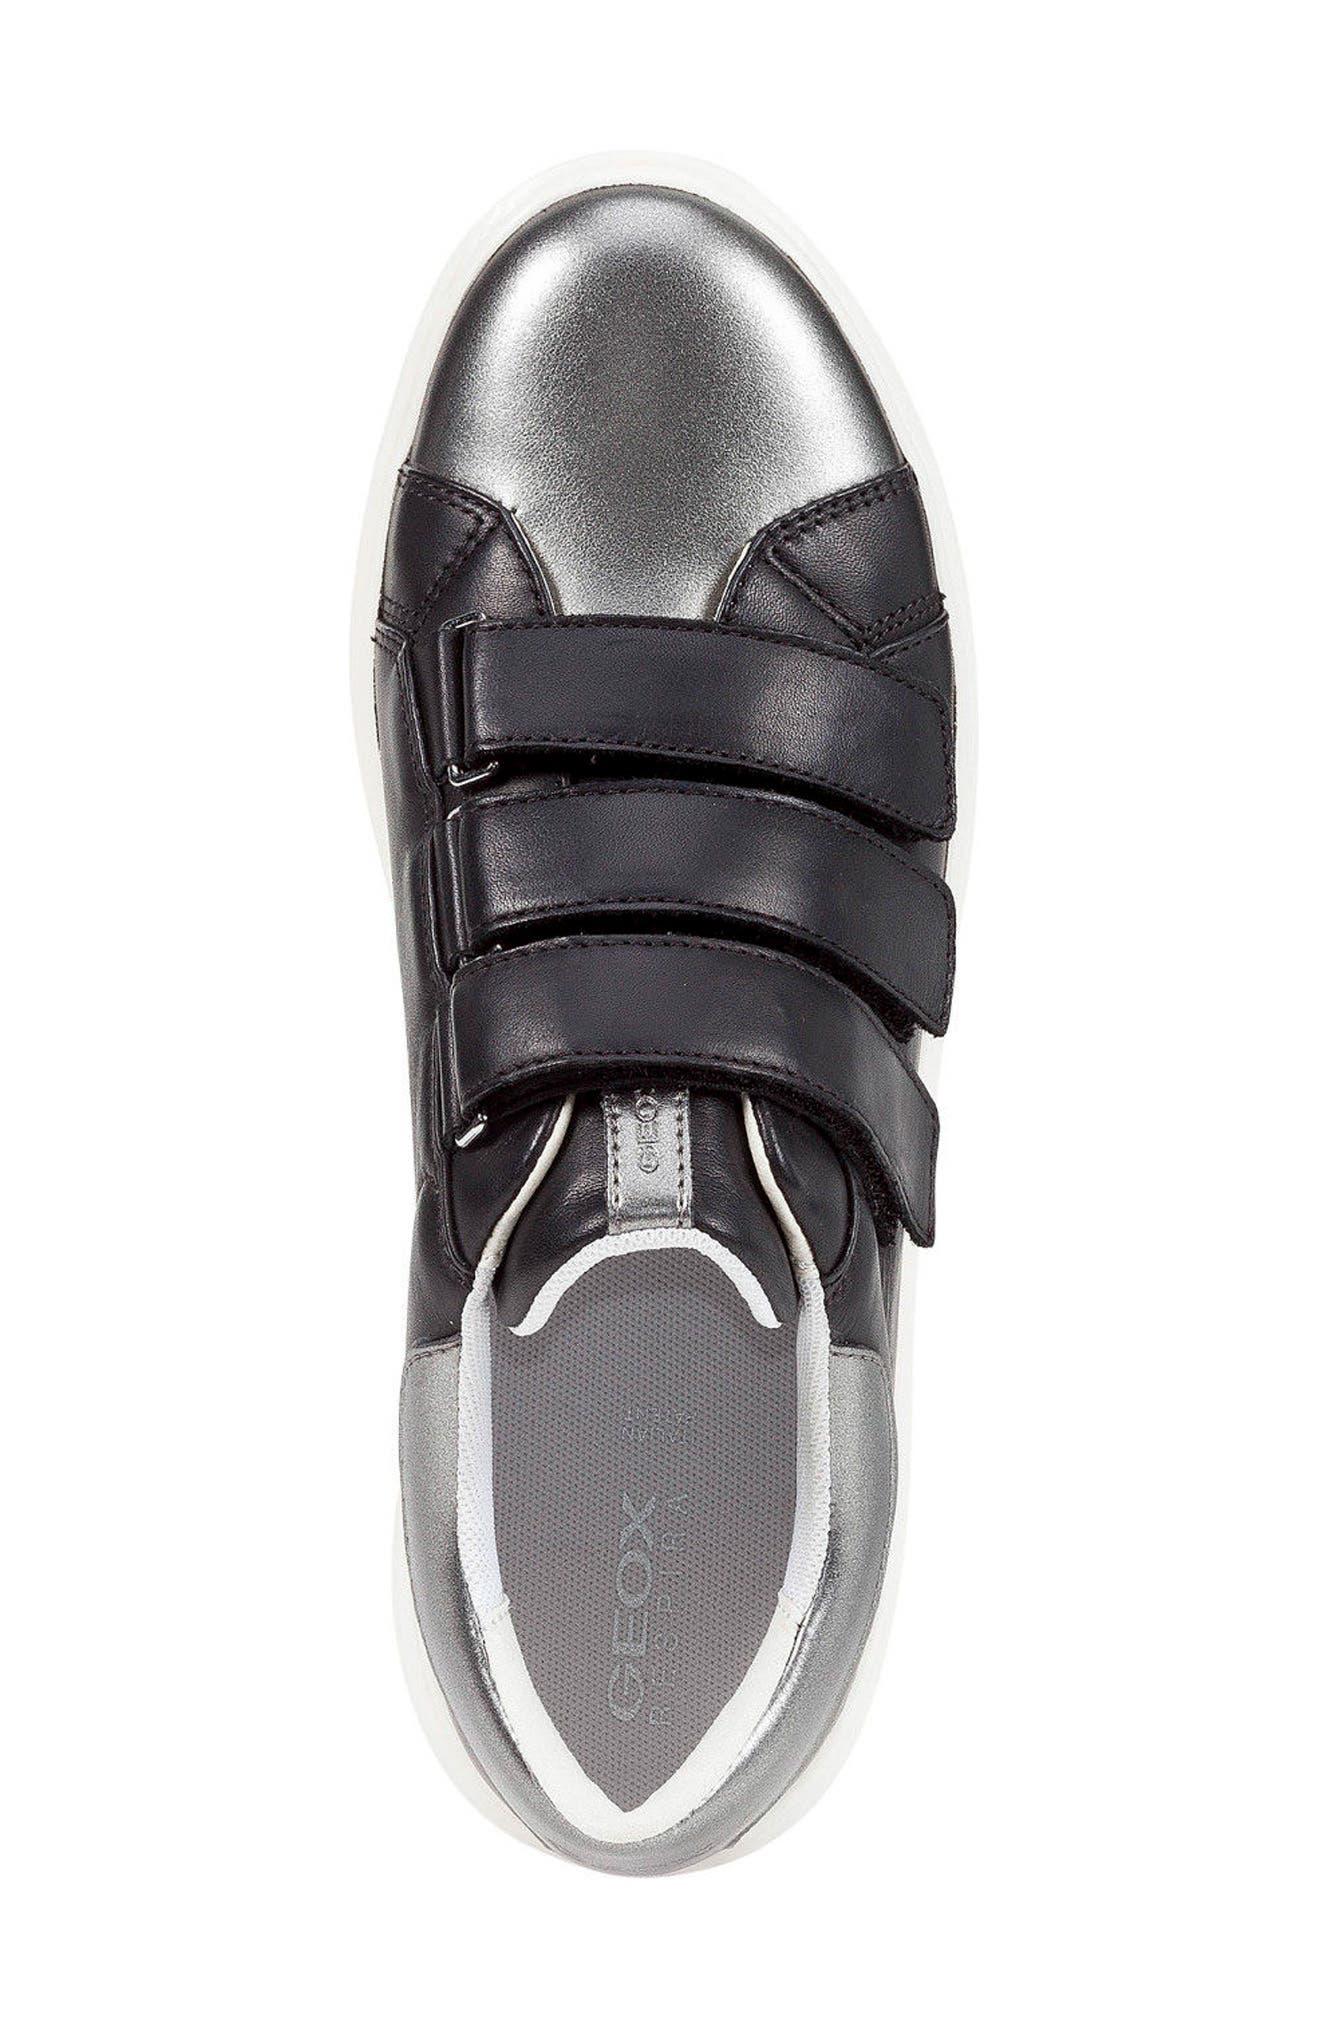 Nhenbus 3 Sneaker,                             Alternate thumbnail 4, color,                             BLACK LEATHER